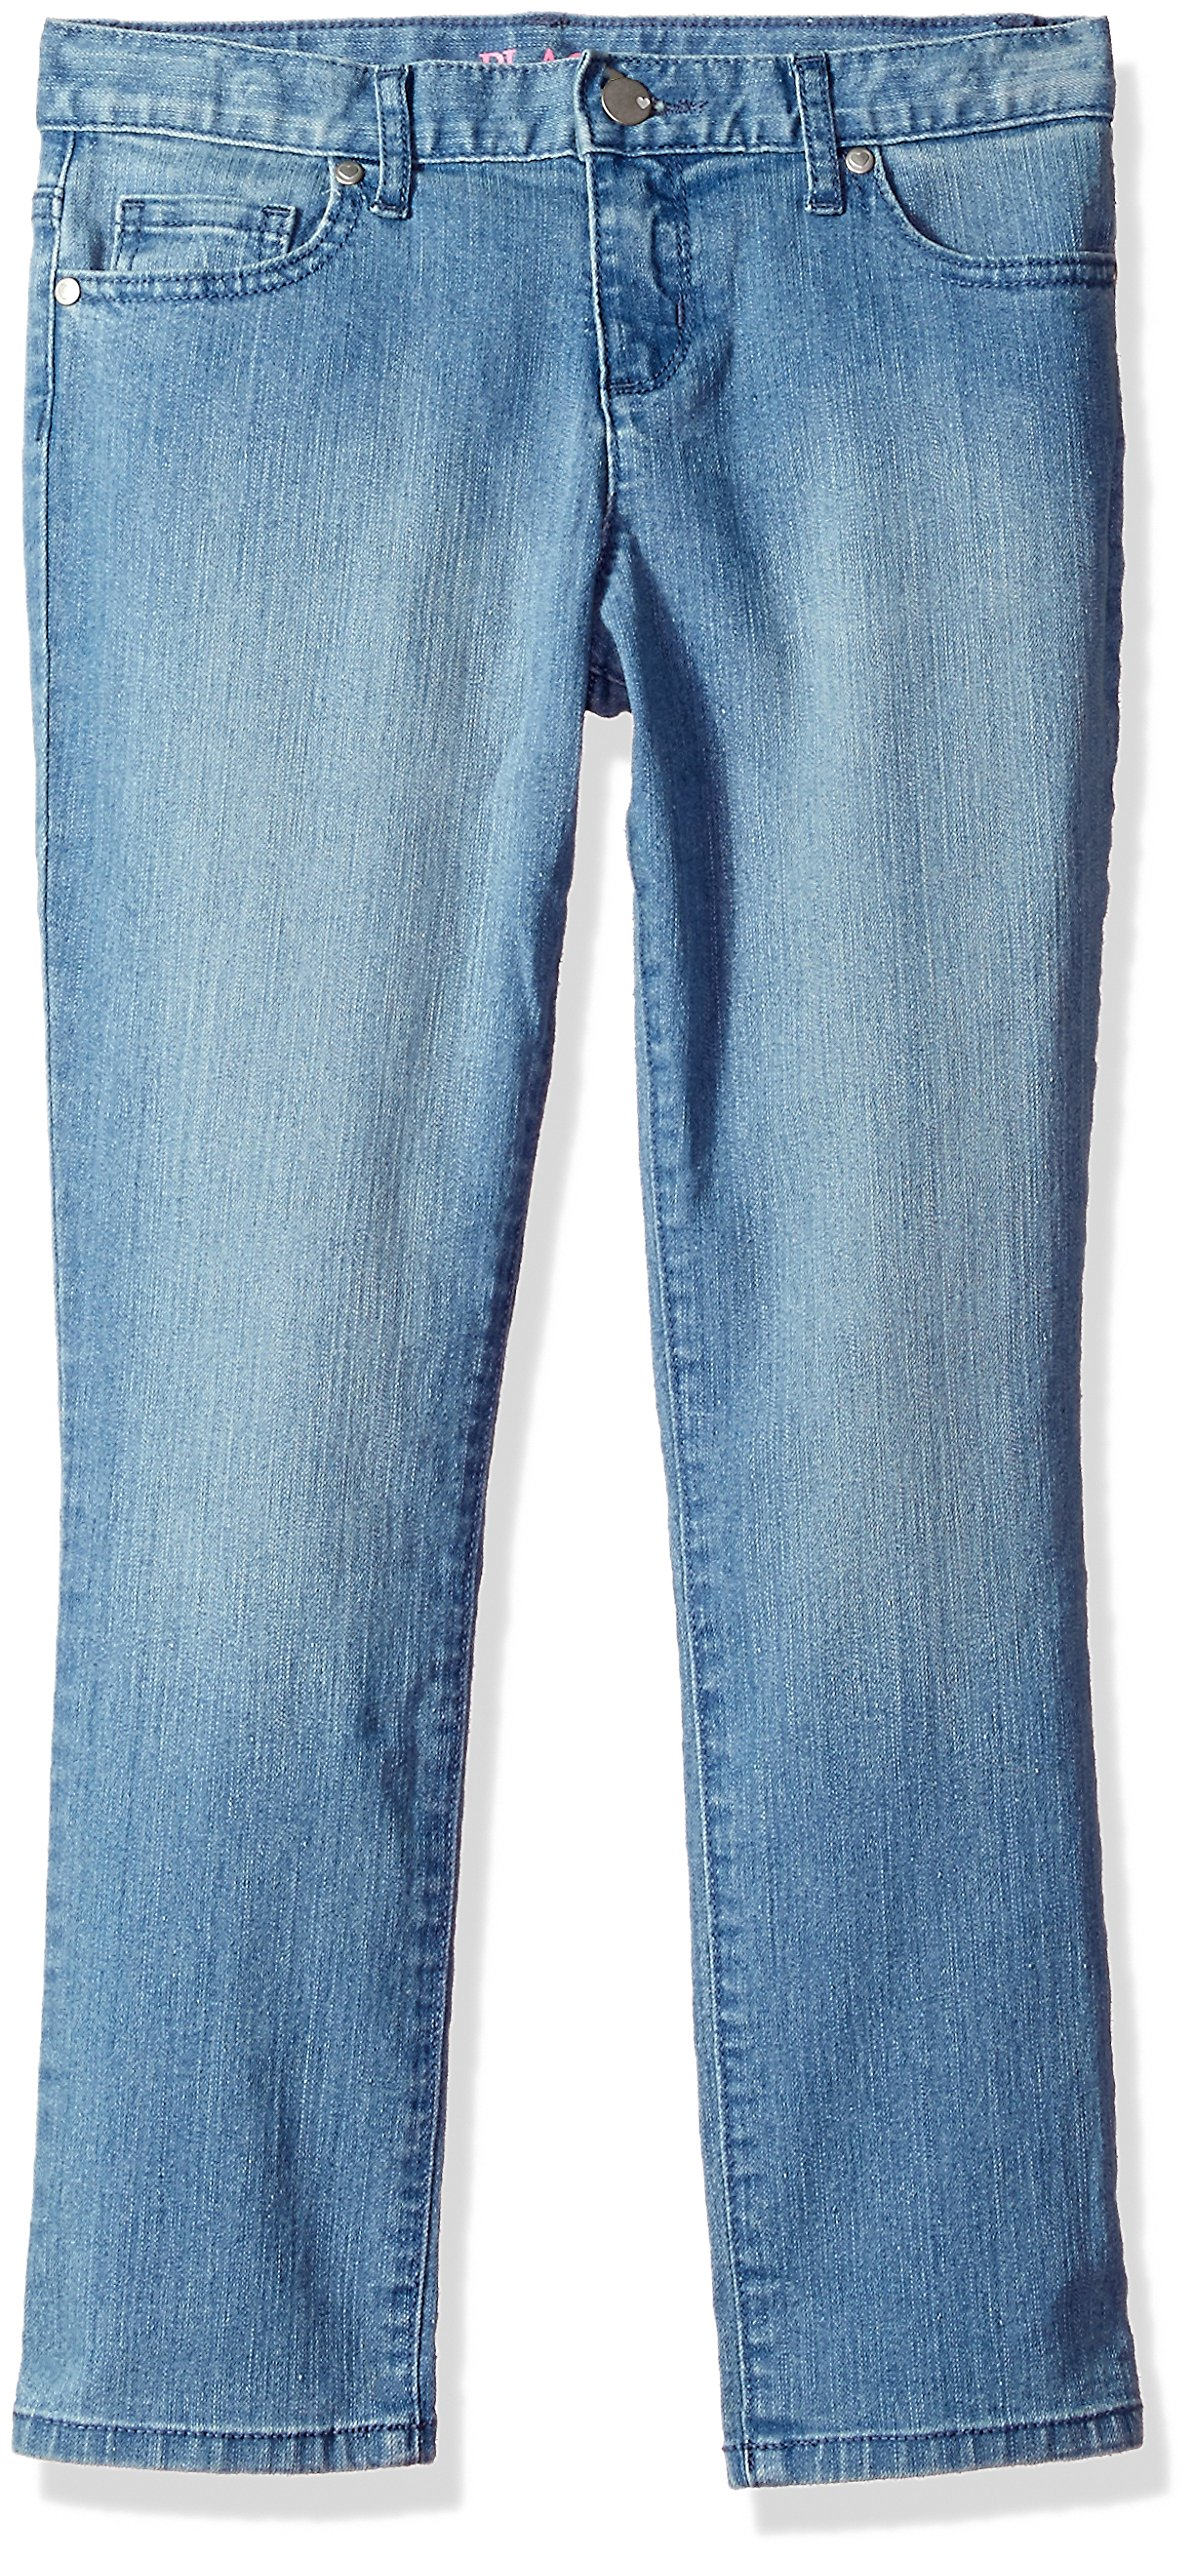 The Children's Place Big Girls' Skinny Jeans, Light Indigo Girls, 16P